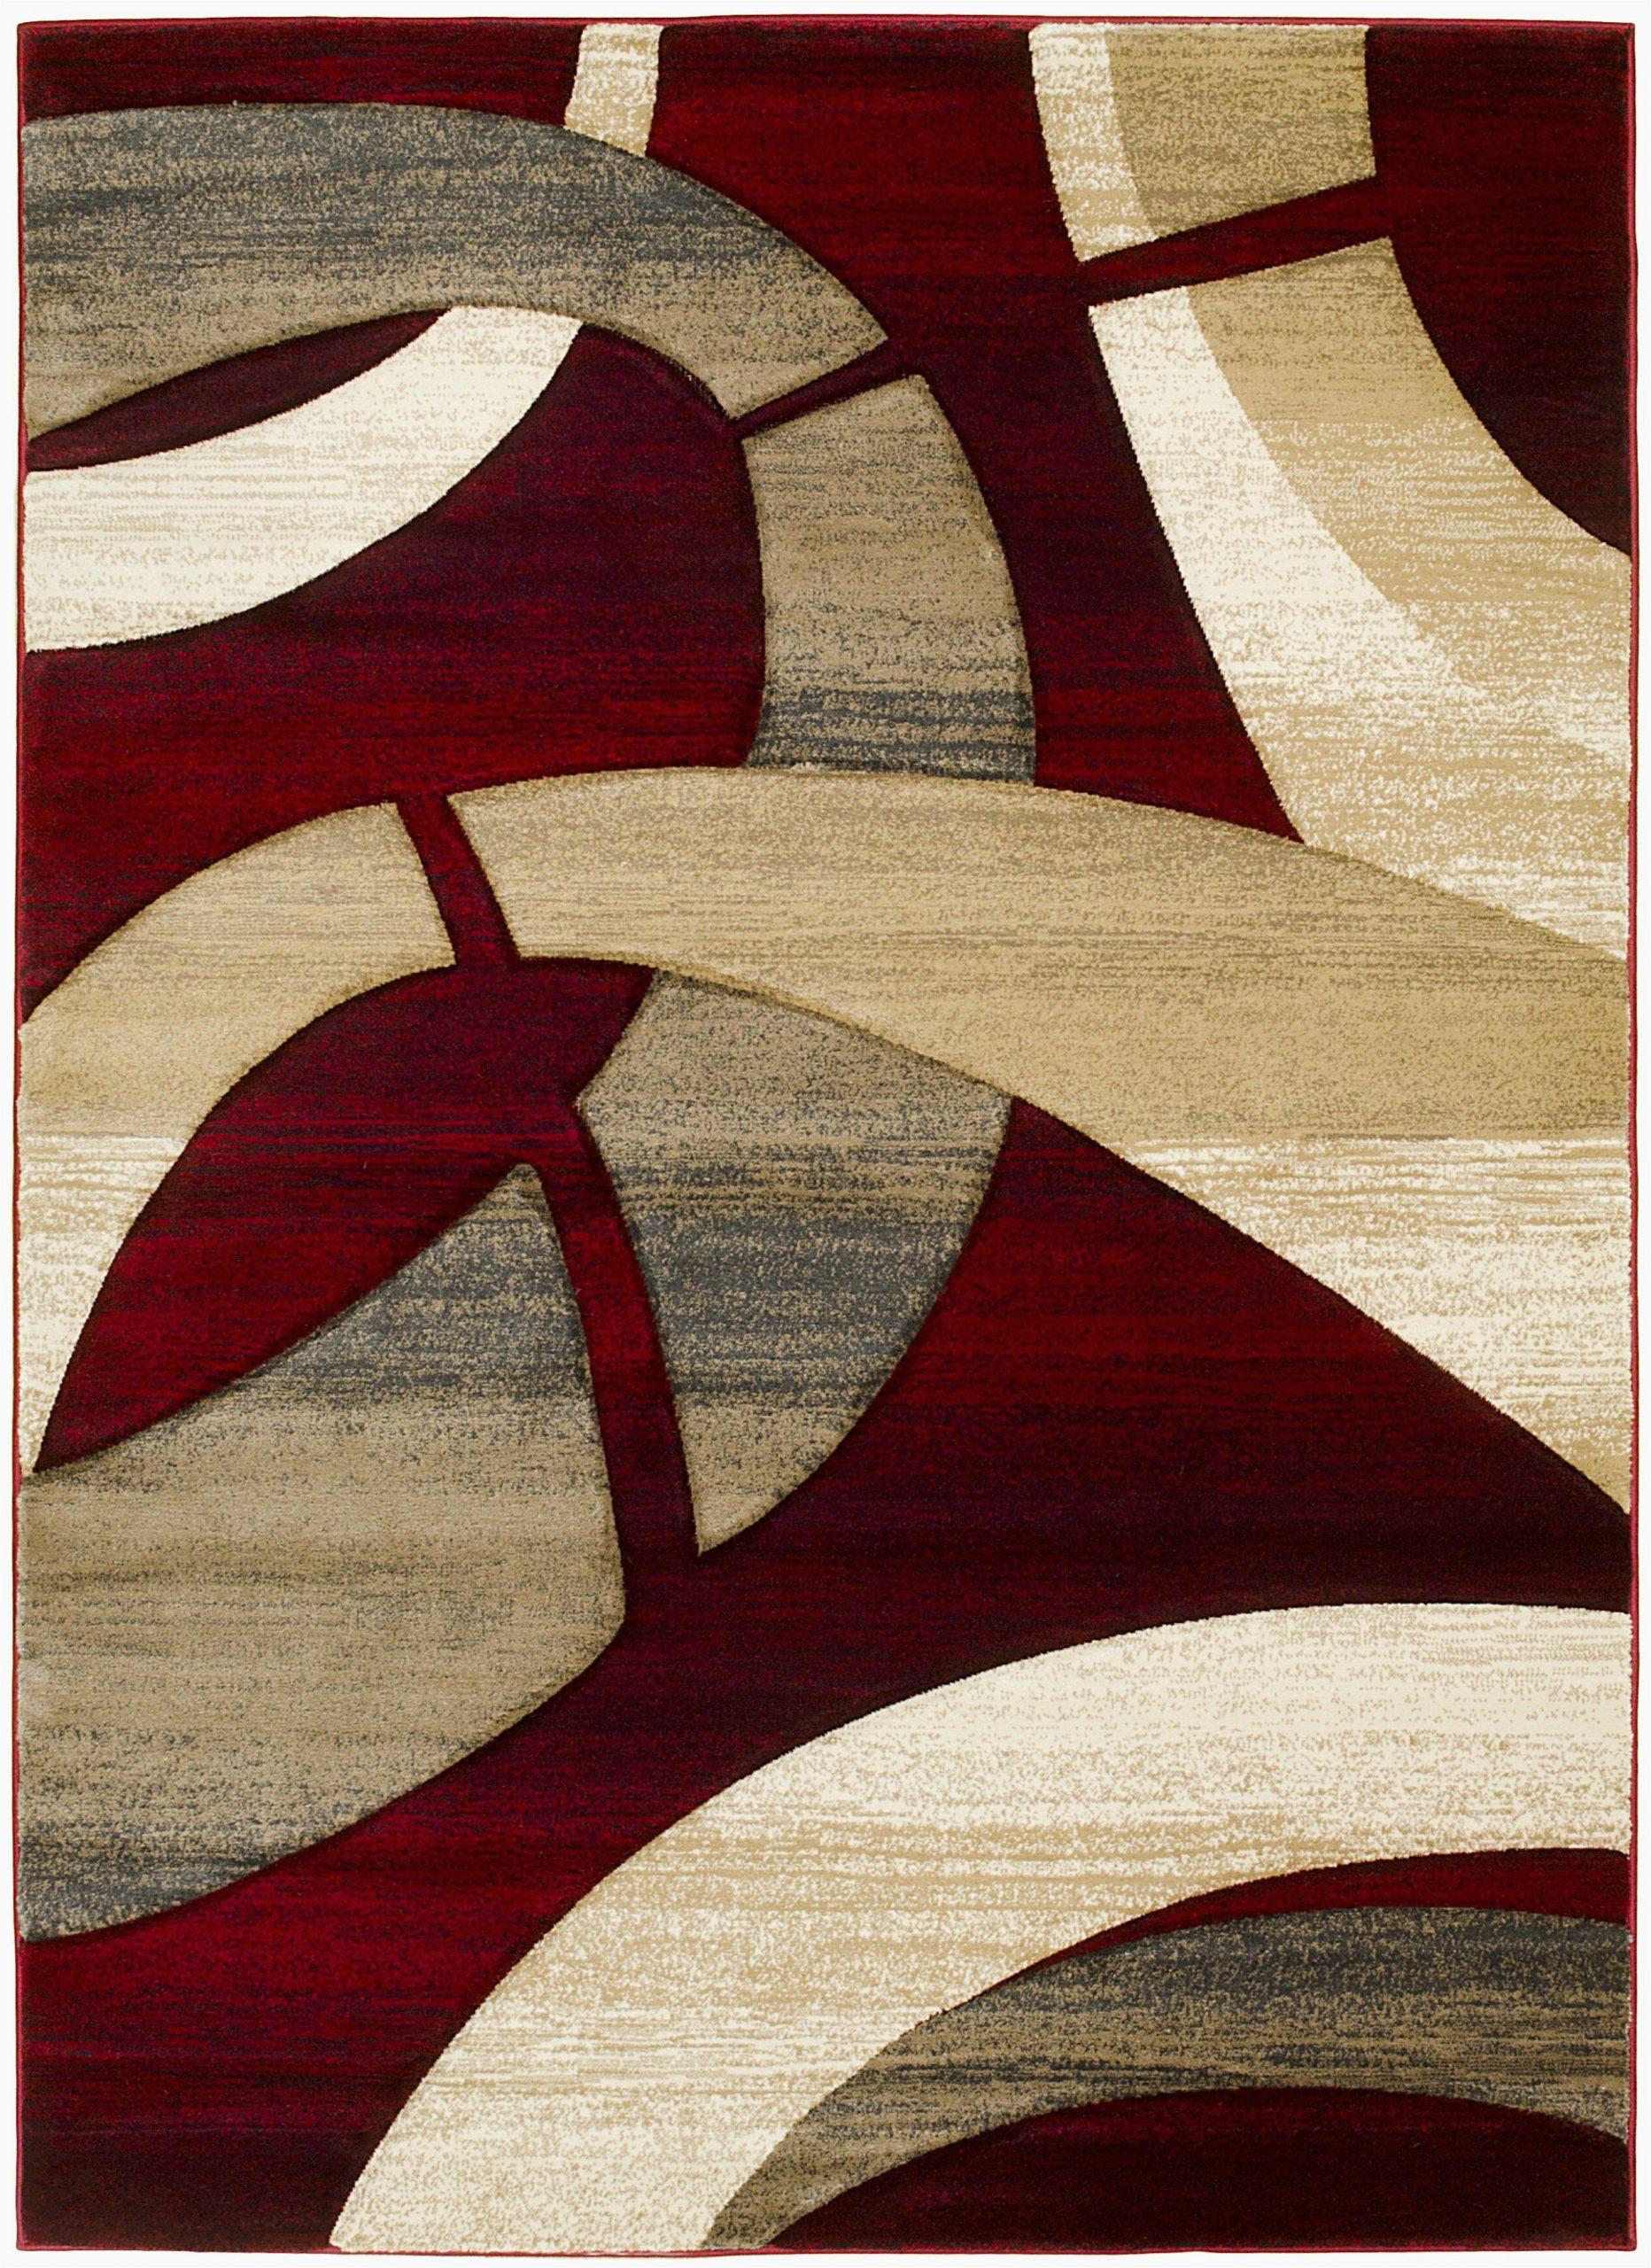 mirabal abstract redtan area rug